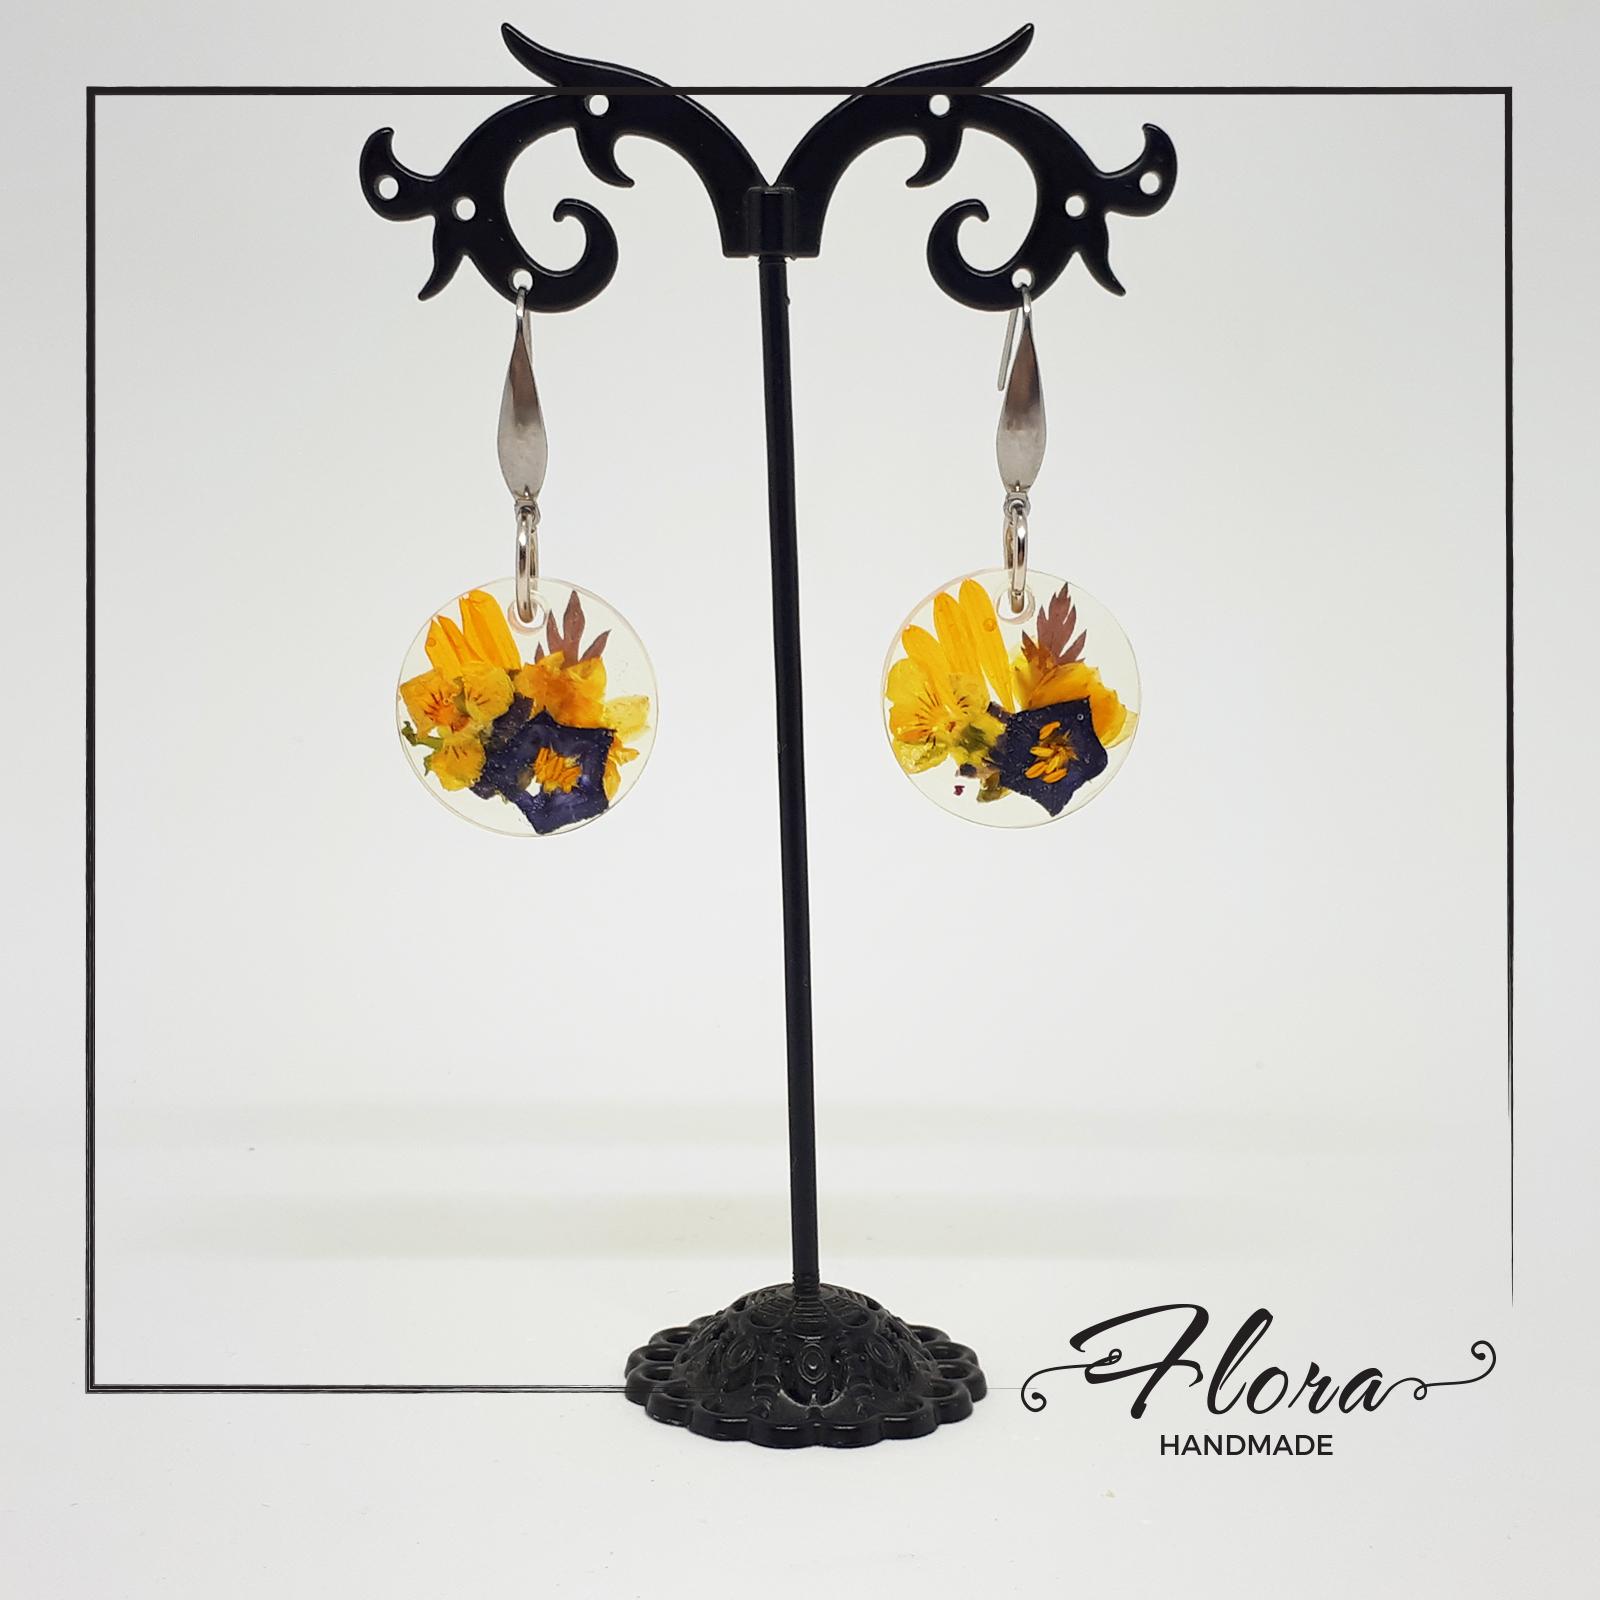 Flora Handmade (8)